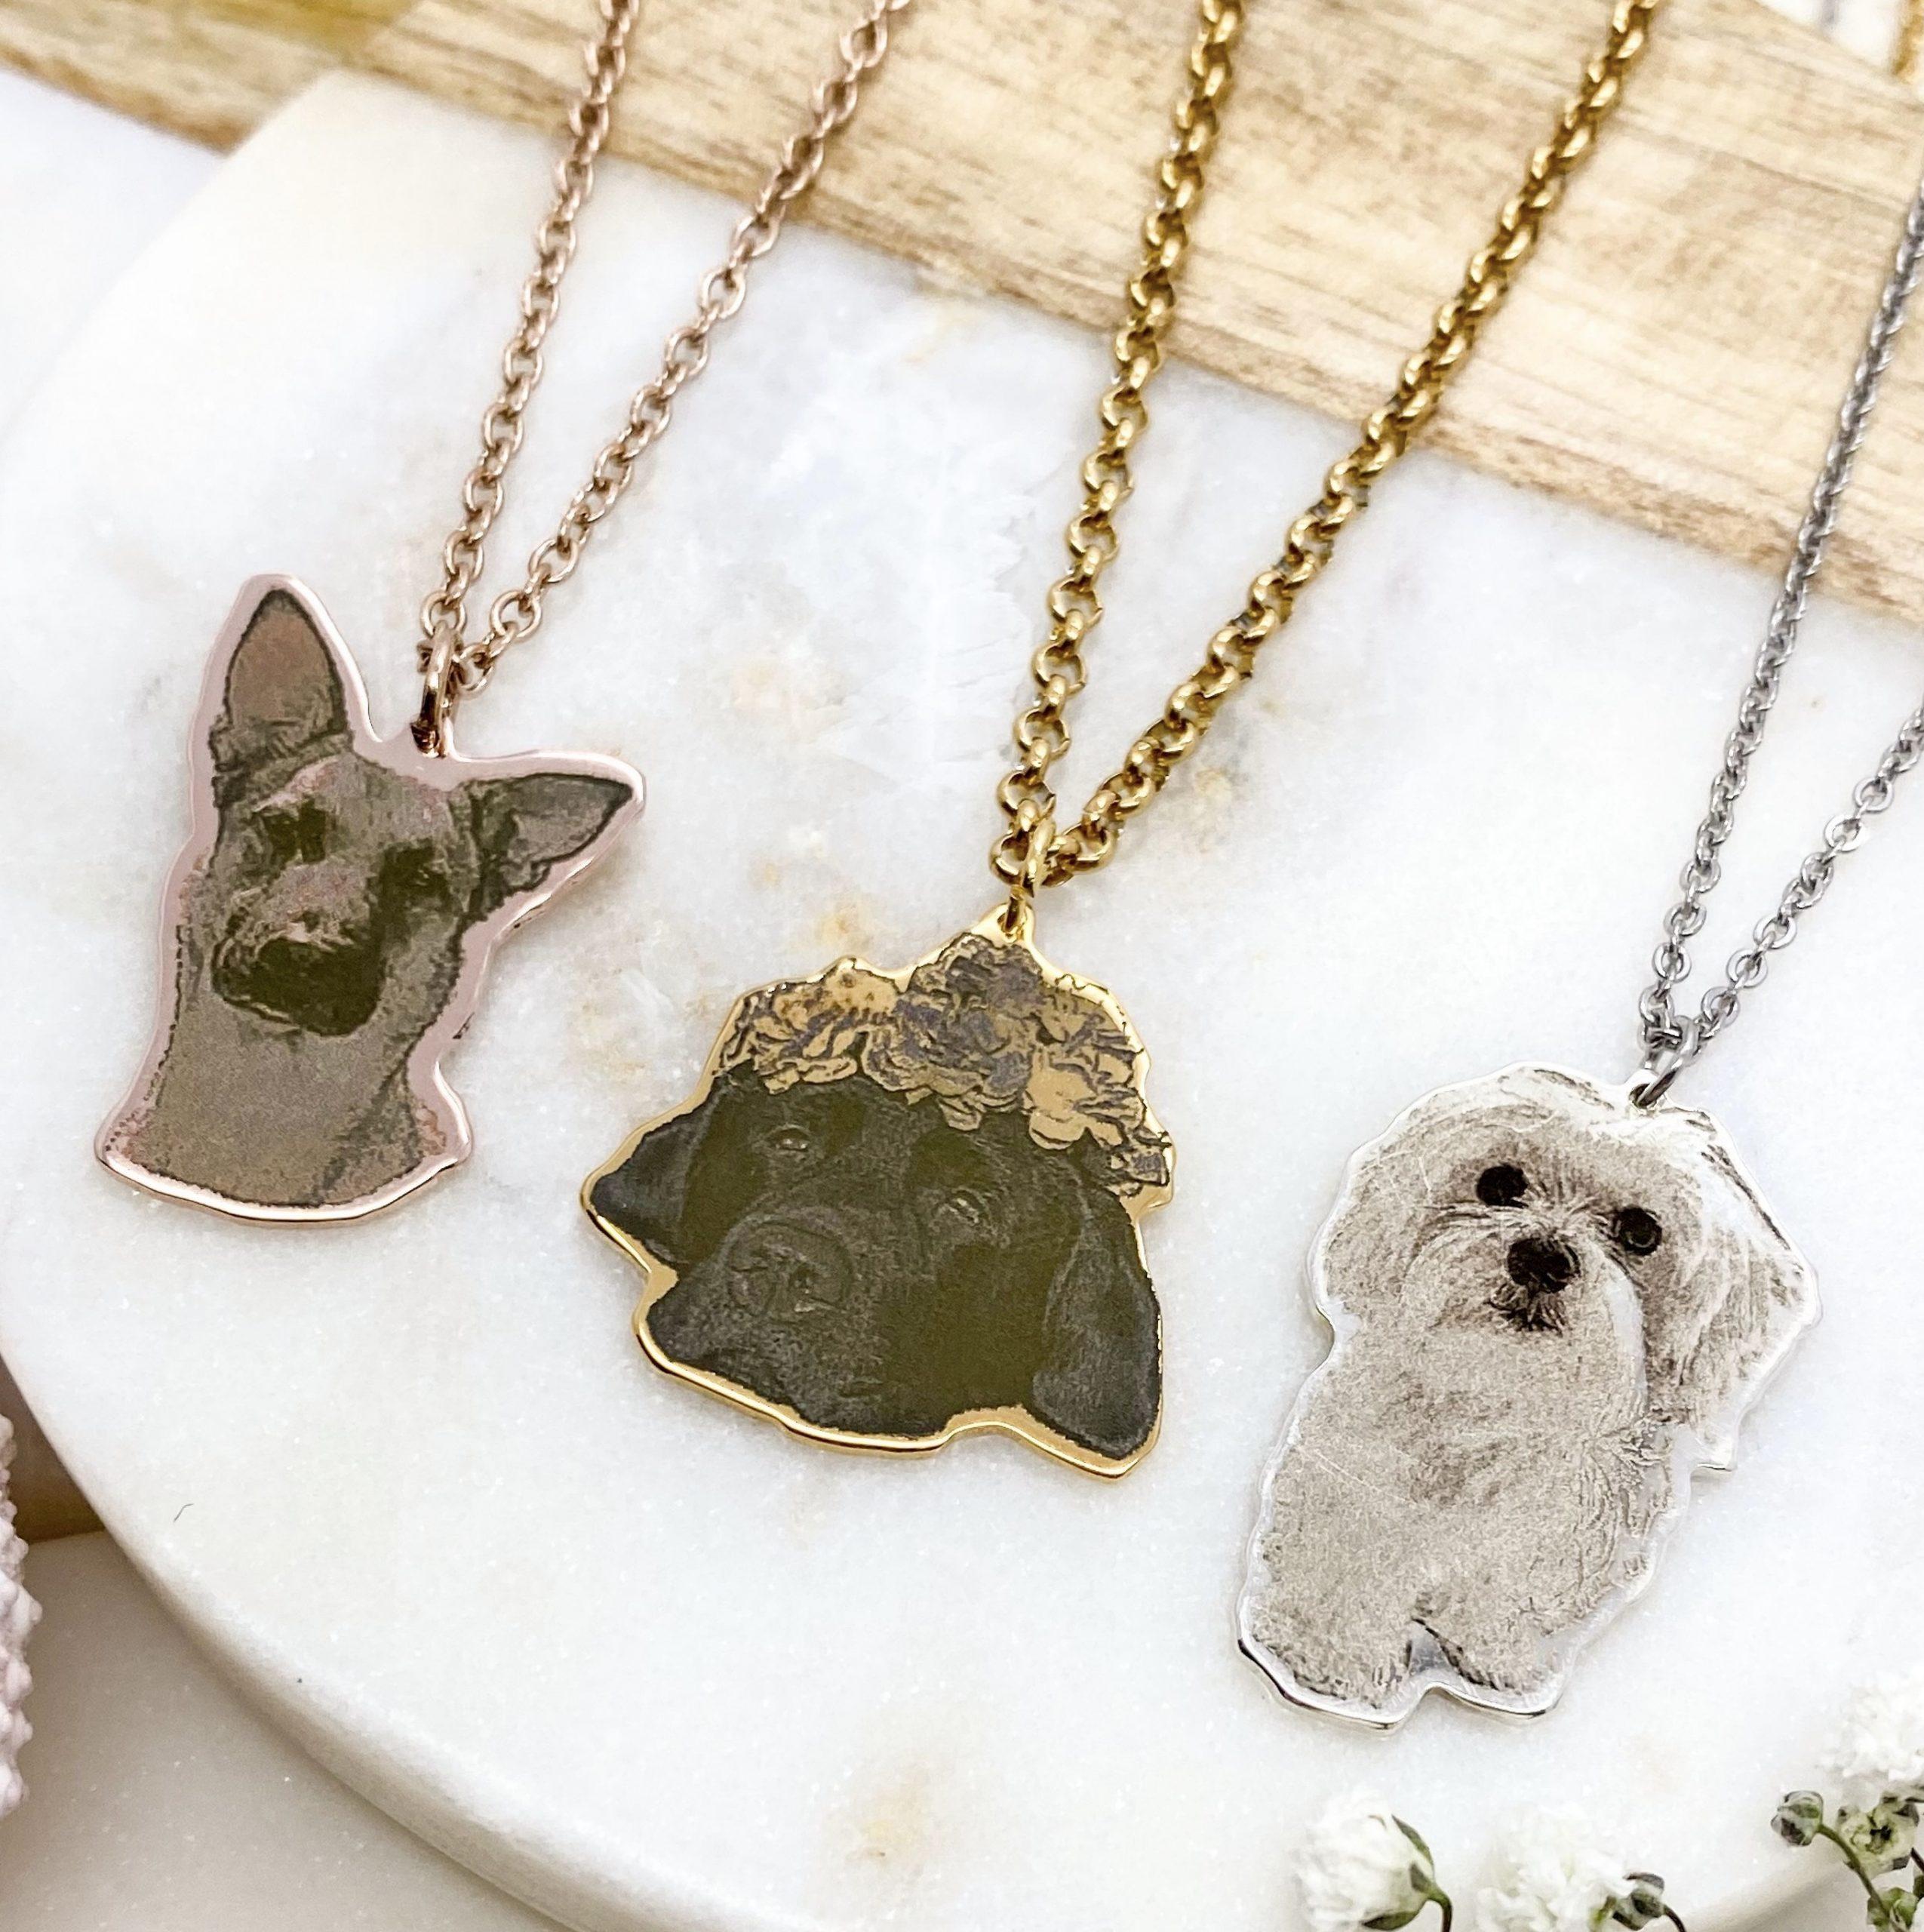 Horse Pattern Necklace,Custom Horse Pendant,Engraved Photo Necklace,Portrait Pendant,Silver Necklace,Custom Jewelry,Pet Photo Necklace,Gift